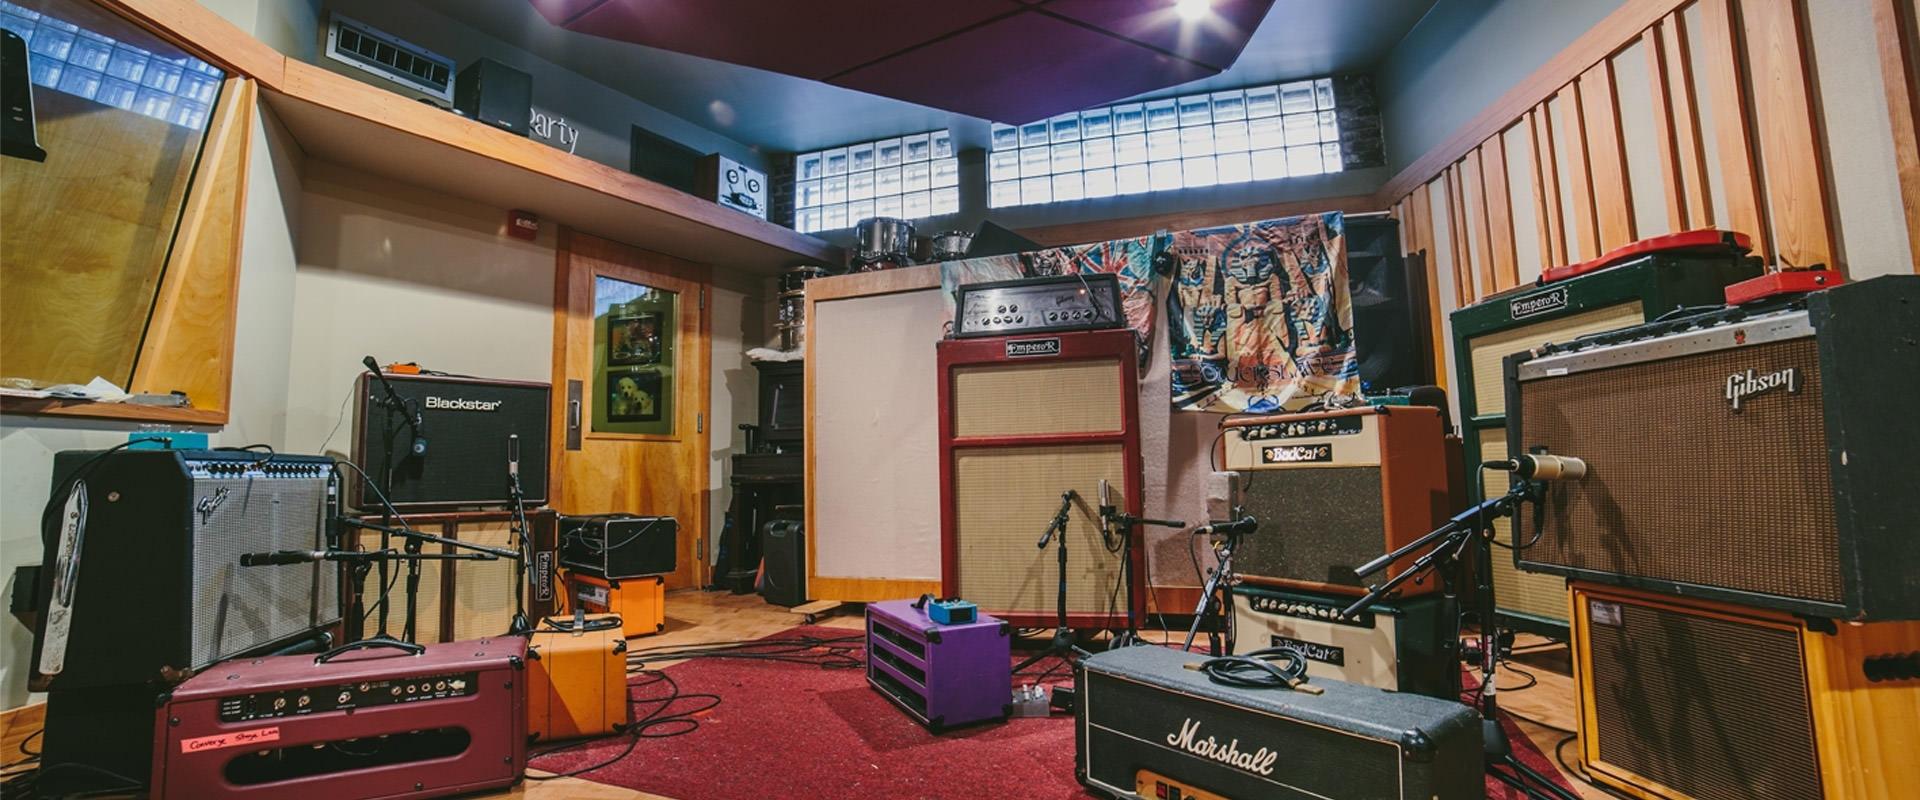 studioPic